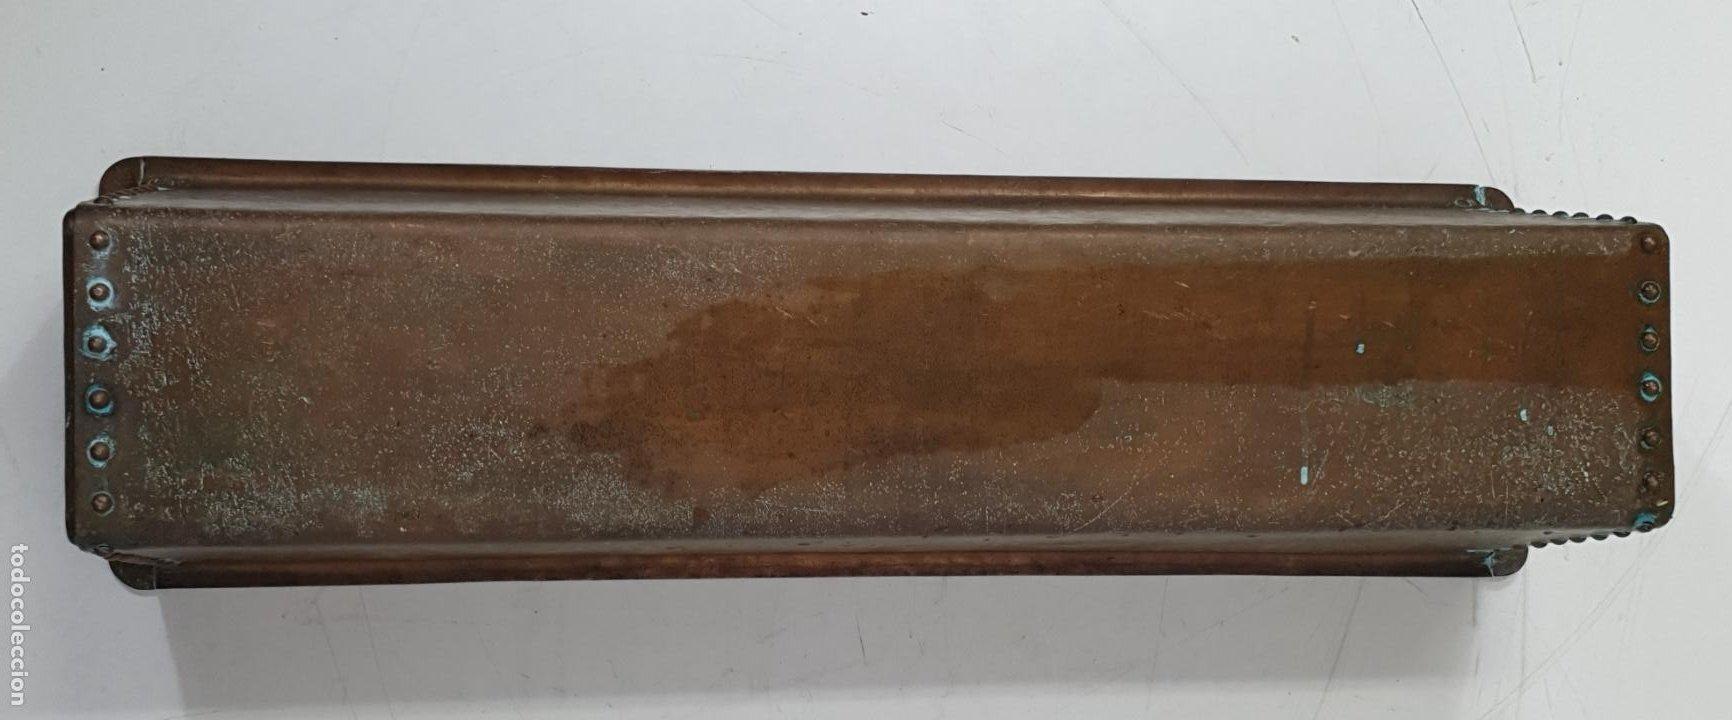 Antigüedades: Gran Macetero, Jardinera de Cobre - Largo 100 cm - Fondo - 31 cm - Altura 28 - Peso 21 Kg - Foto 5 - 283937038